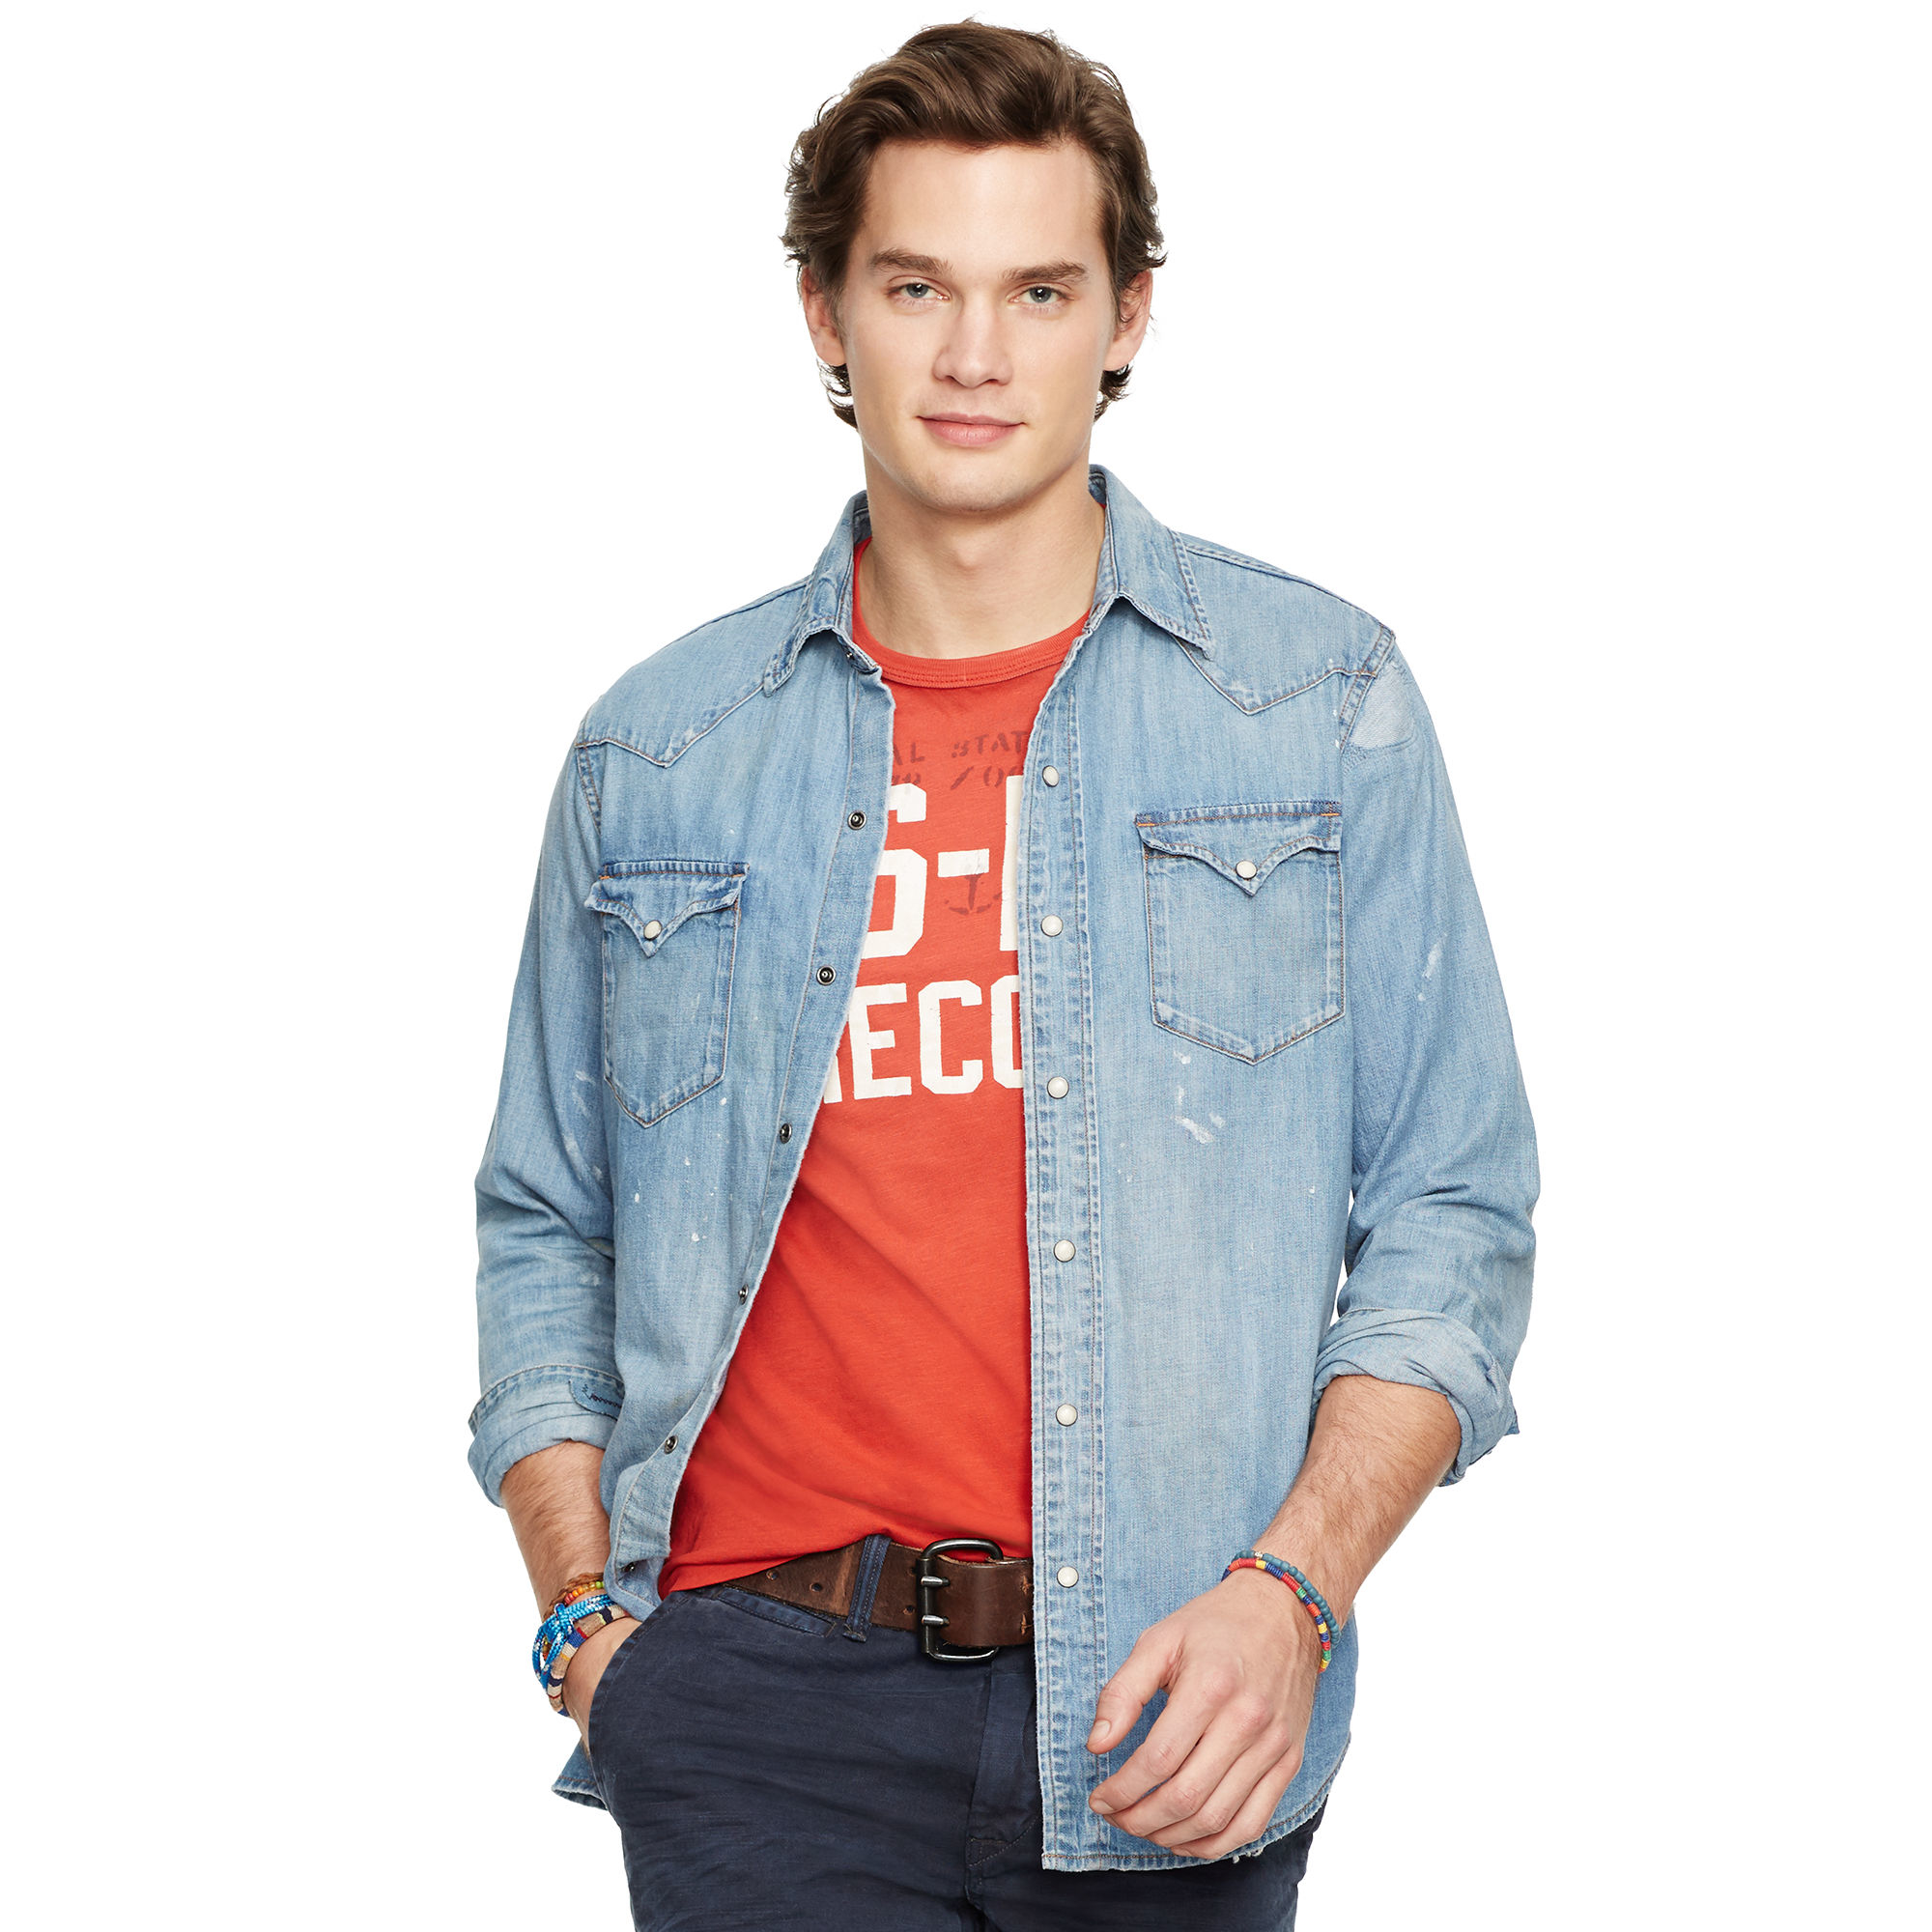 f4a4db82fef Polo Ralph Lauren Distressed Denim Western Shirt in Blue for Men - Lyst